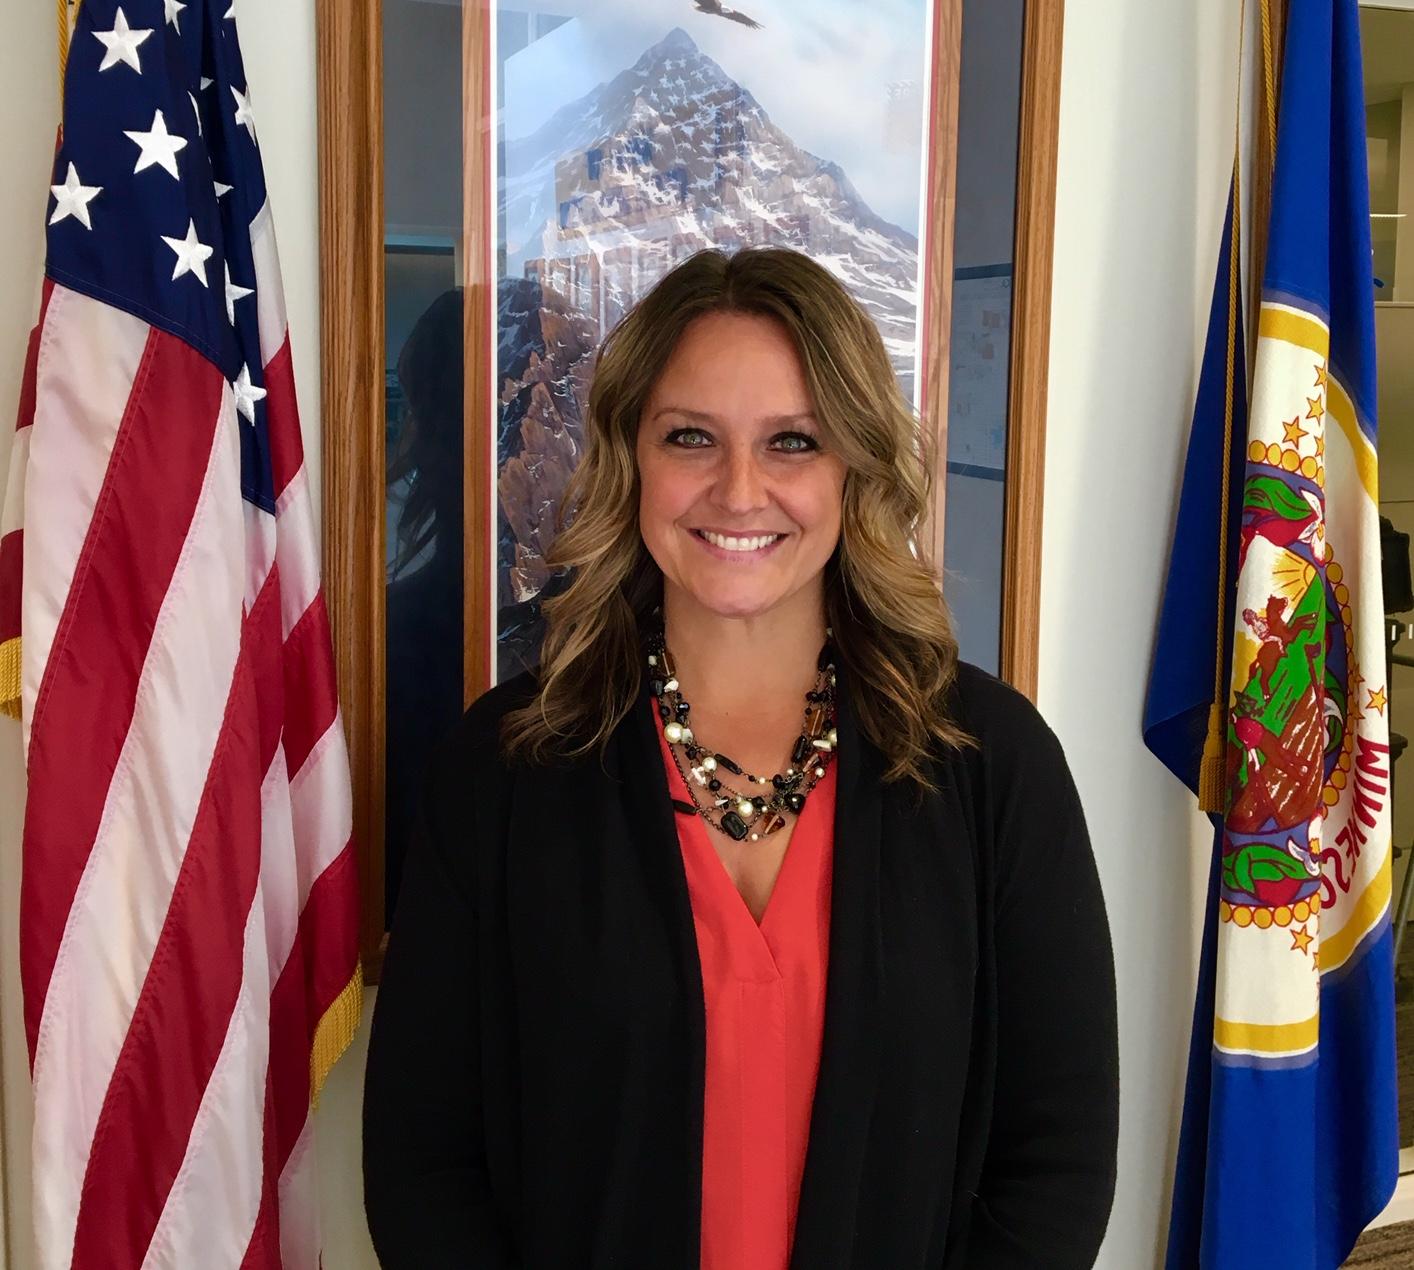 Janell Twardowski, Minnesota AMBER Alert Coordinator